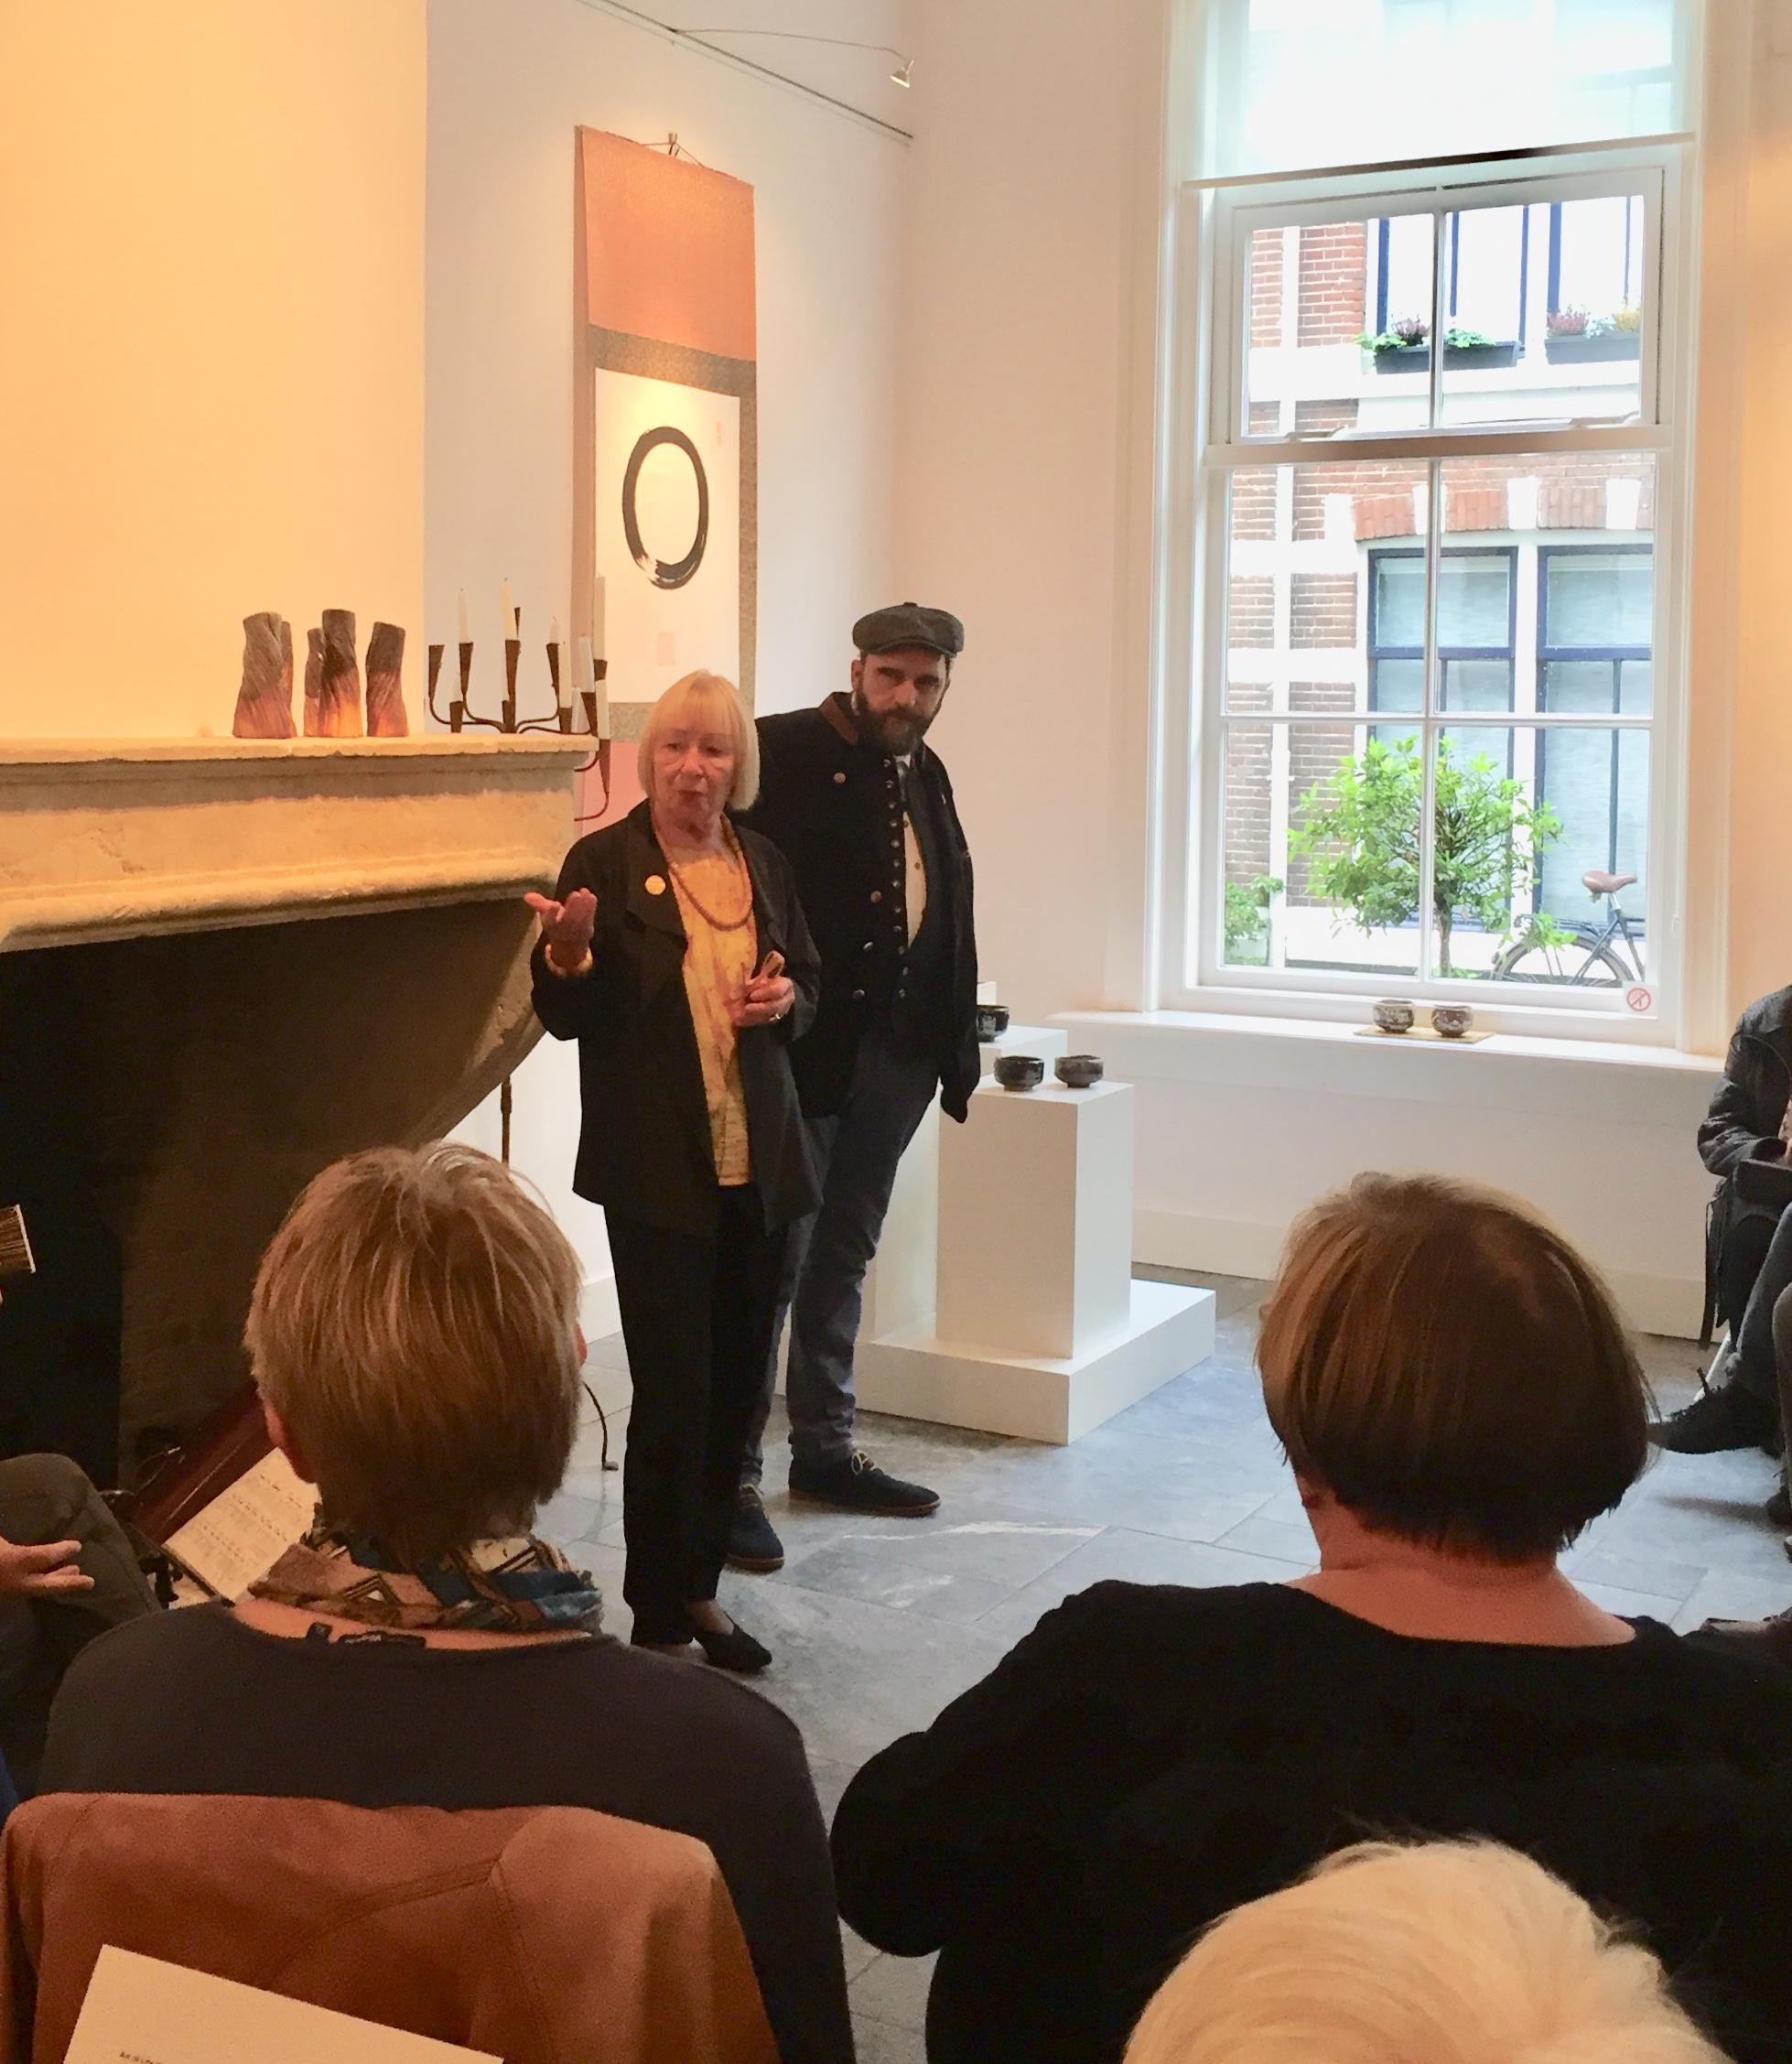 Brigitte Reuter opened the exposition.